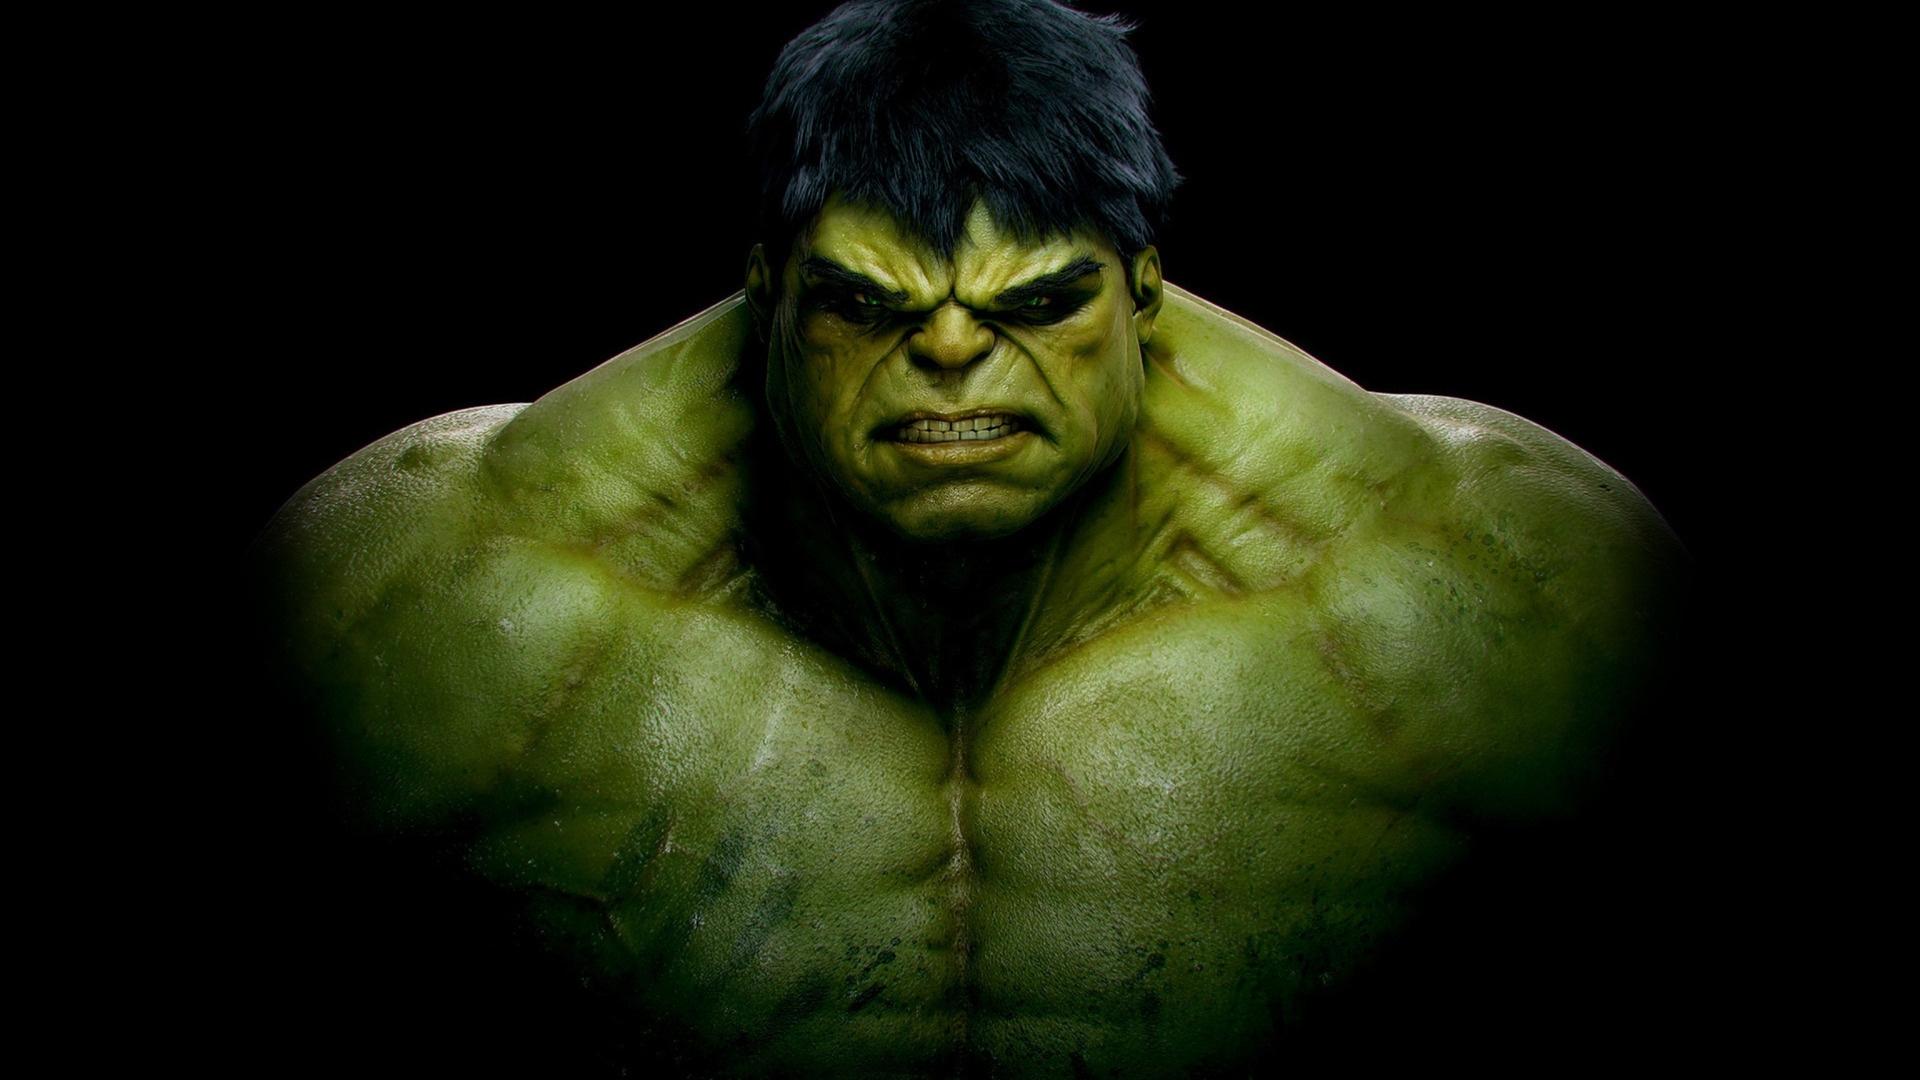 wallpaper : 1920x1080 px, hulk, incredible, marvel, superhero